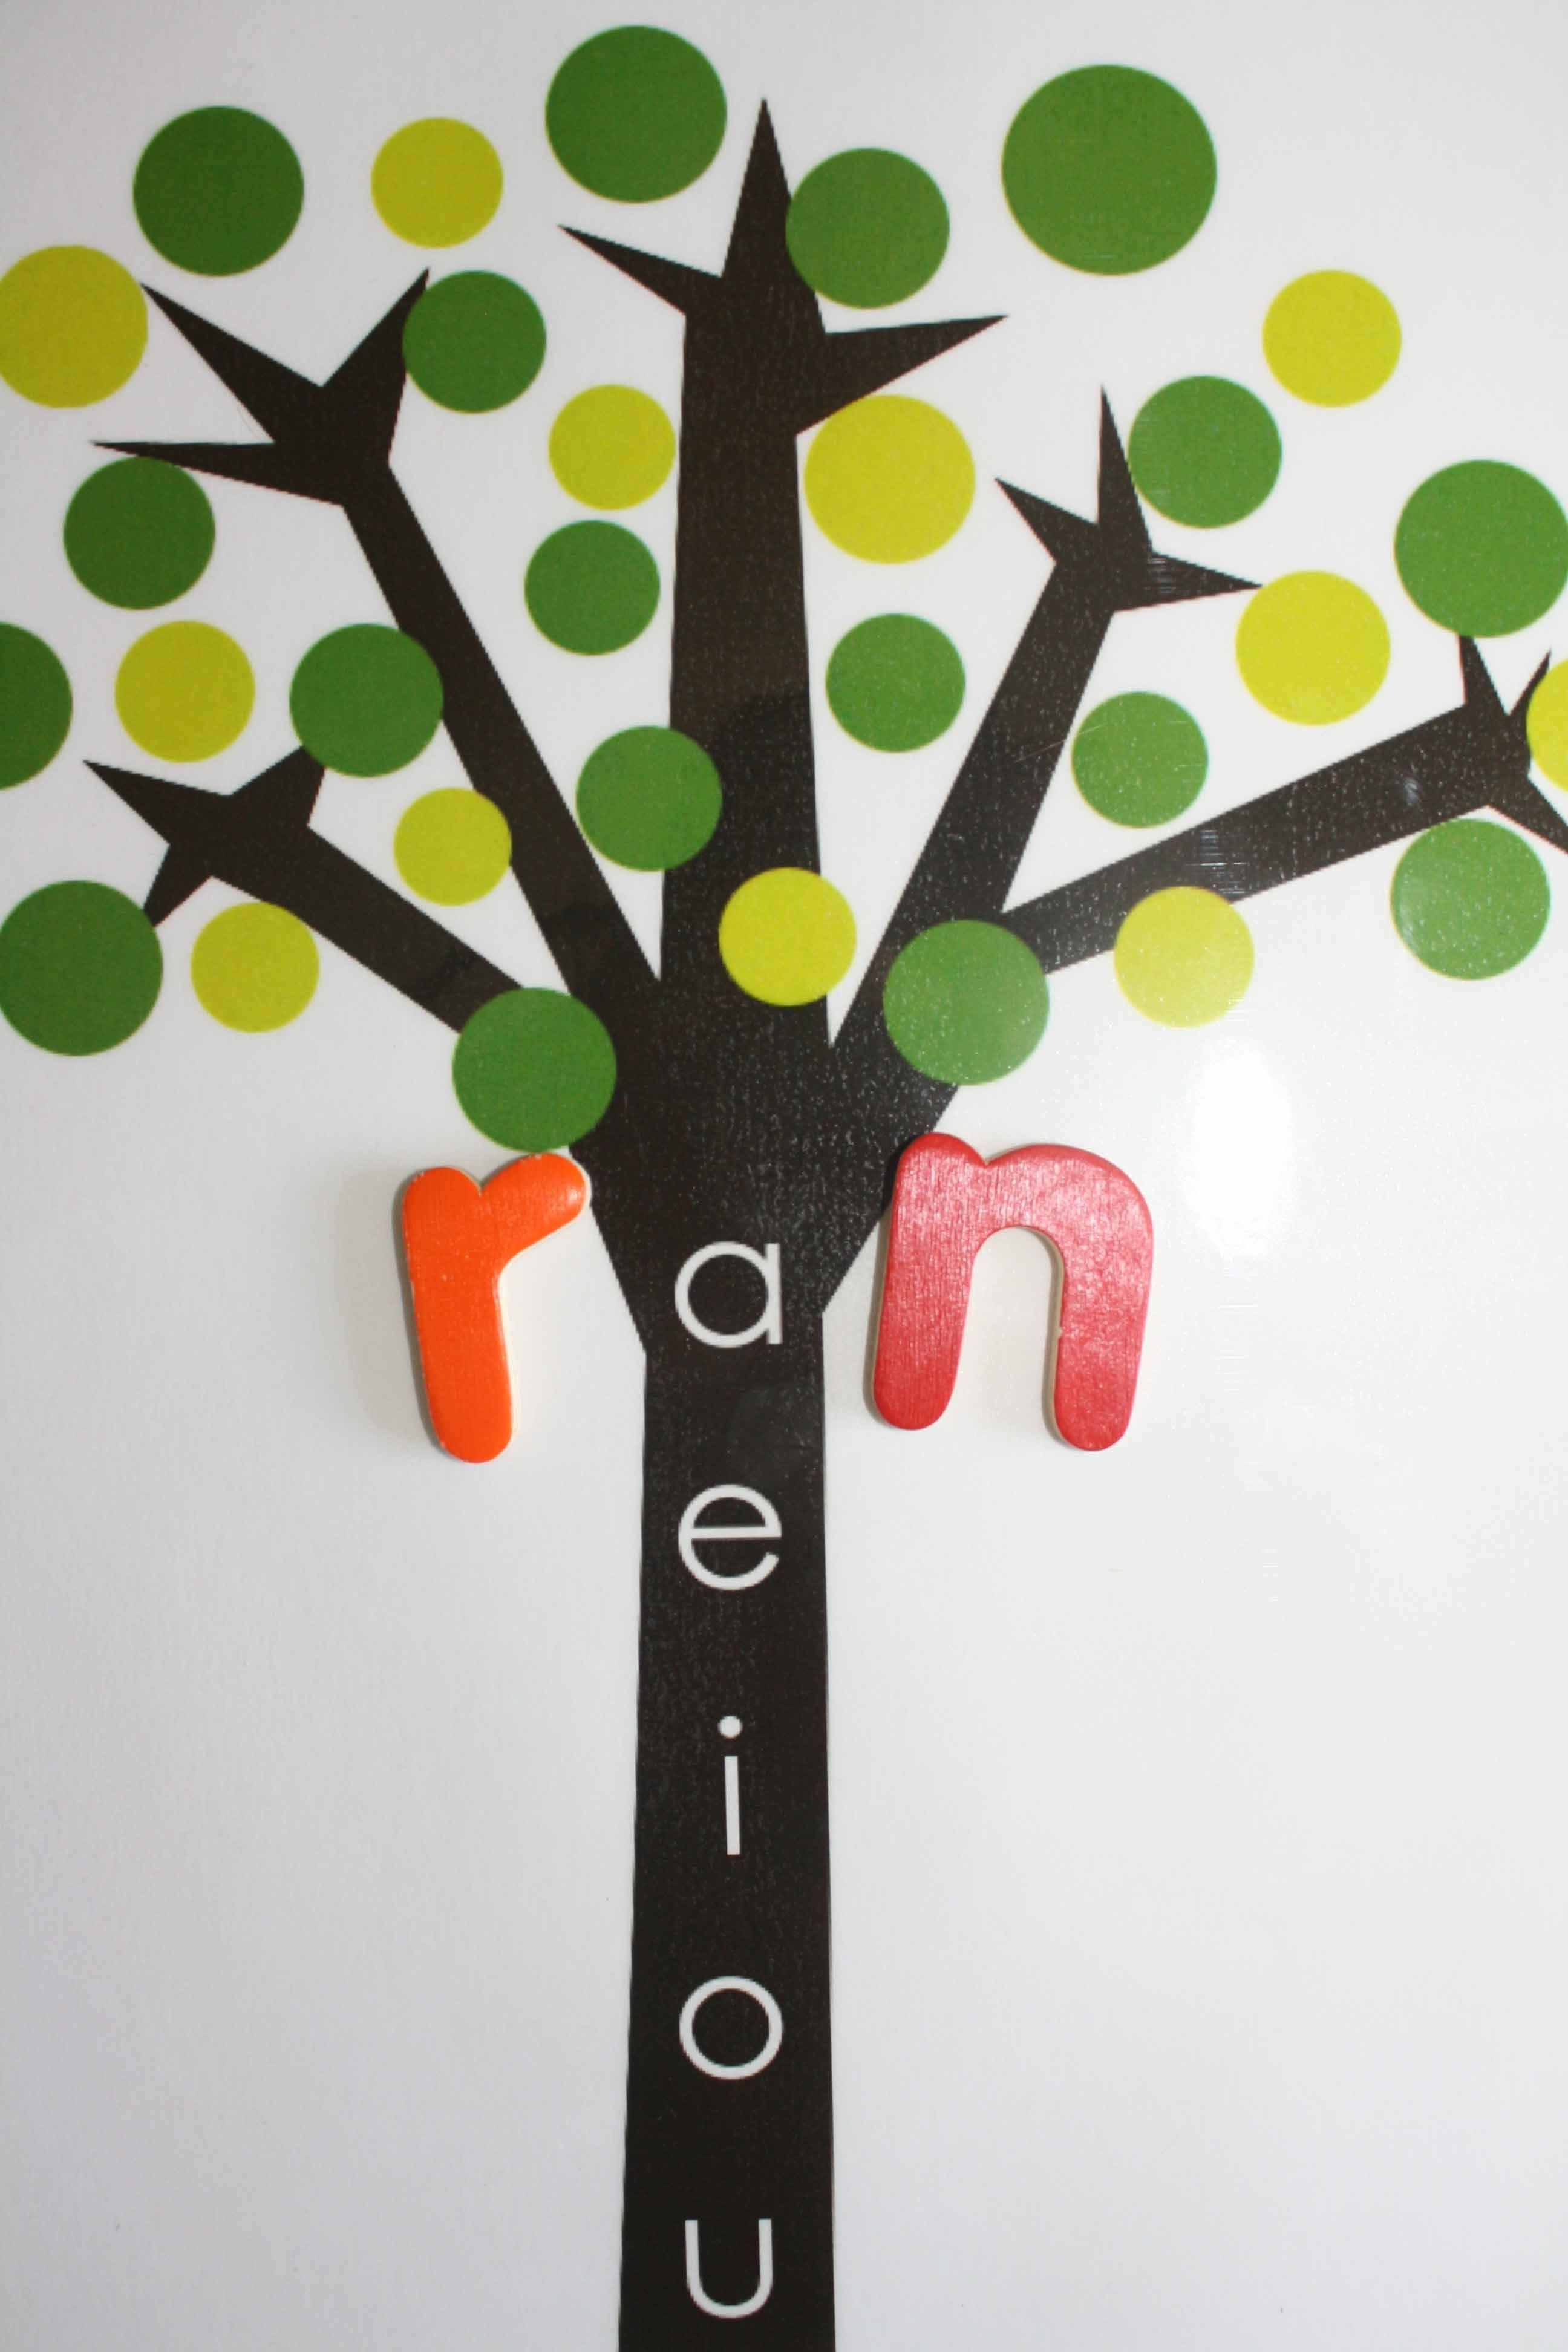 Vowel Tree I Love This Idea Free Printable